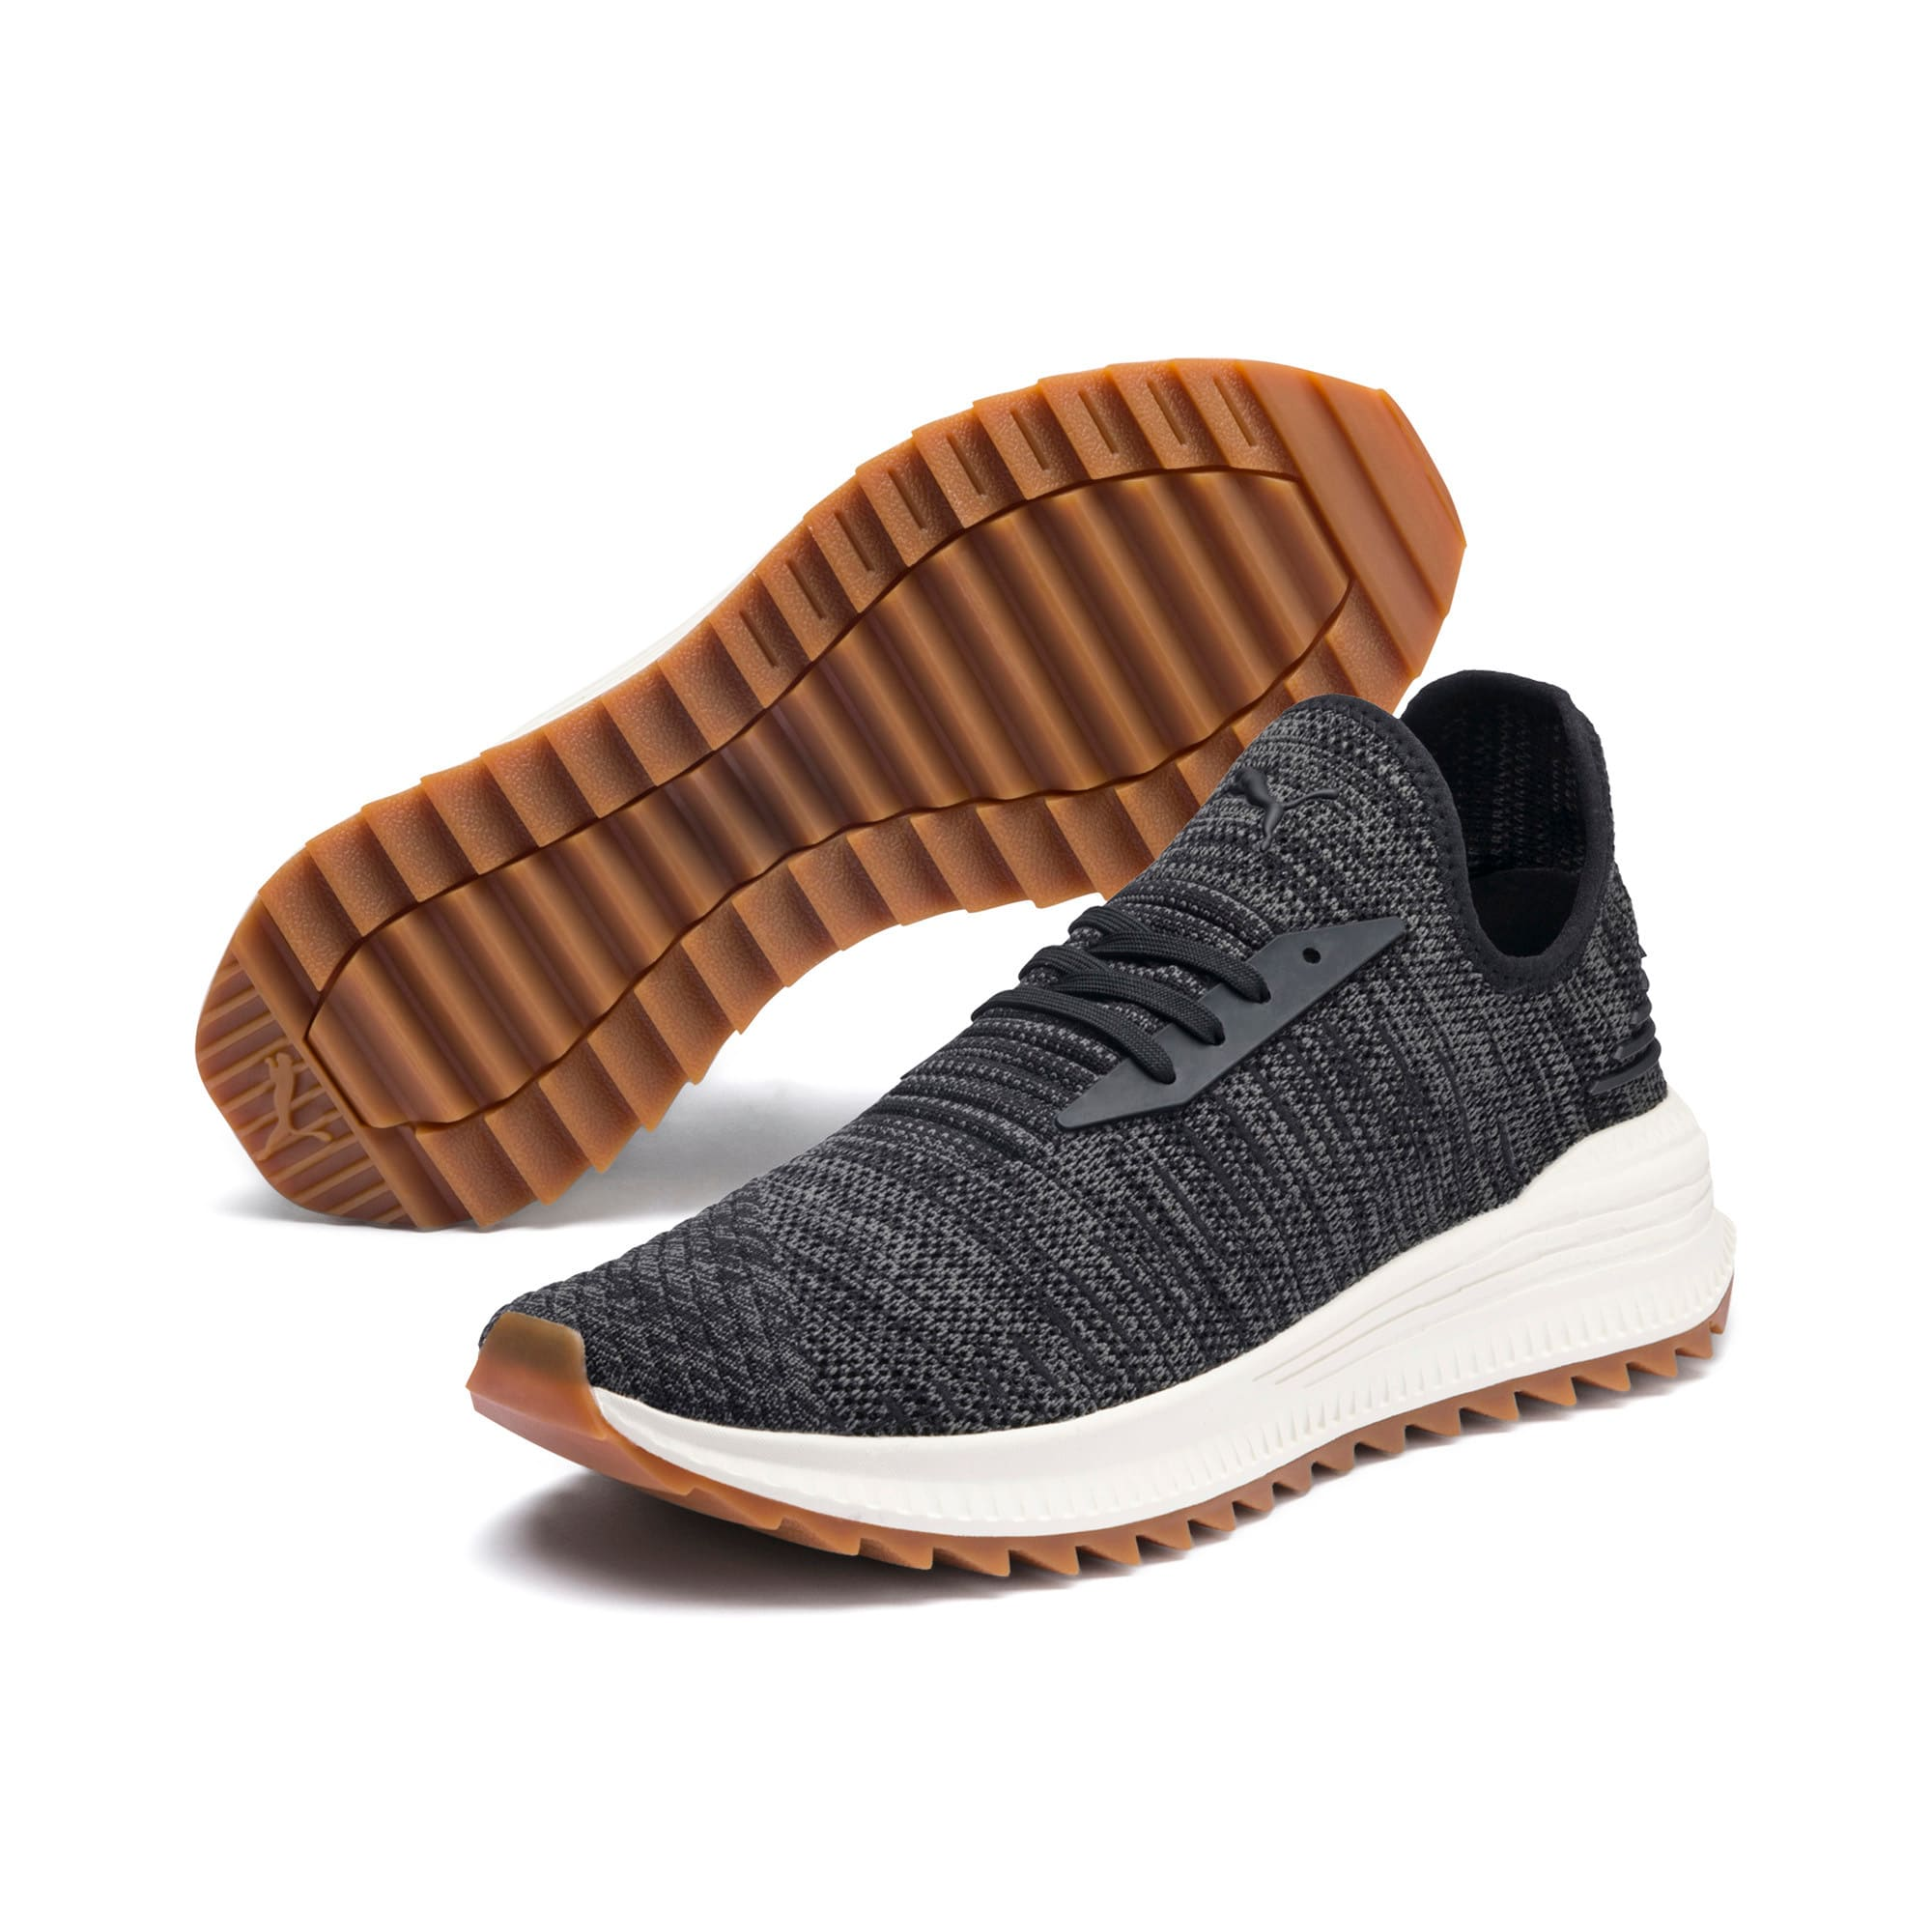 Thumbnail 2 of AVID Repellent Sneakers, Puma Black-Dark Shadow, medium